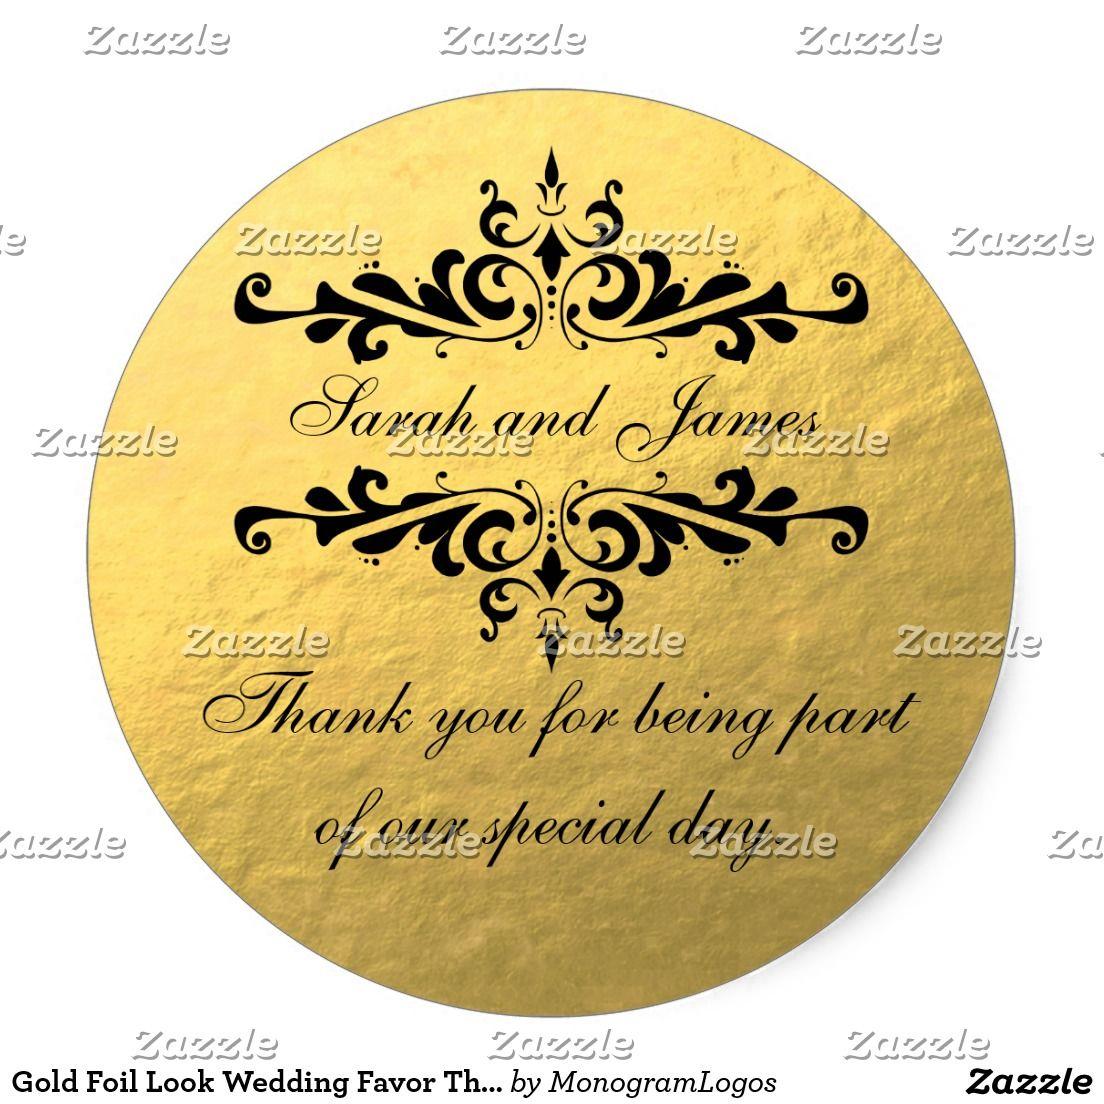 Round Wedding Invitation Label 1: Gold Foil Look Wedding Favor Thank You Label